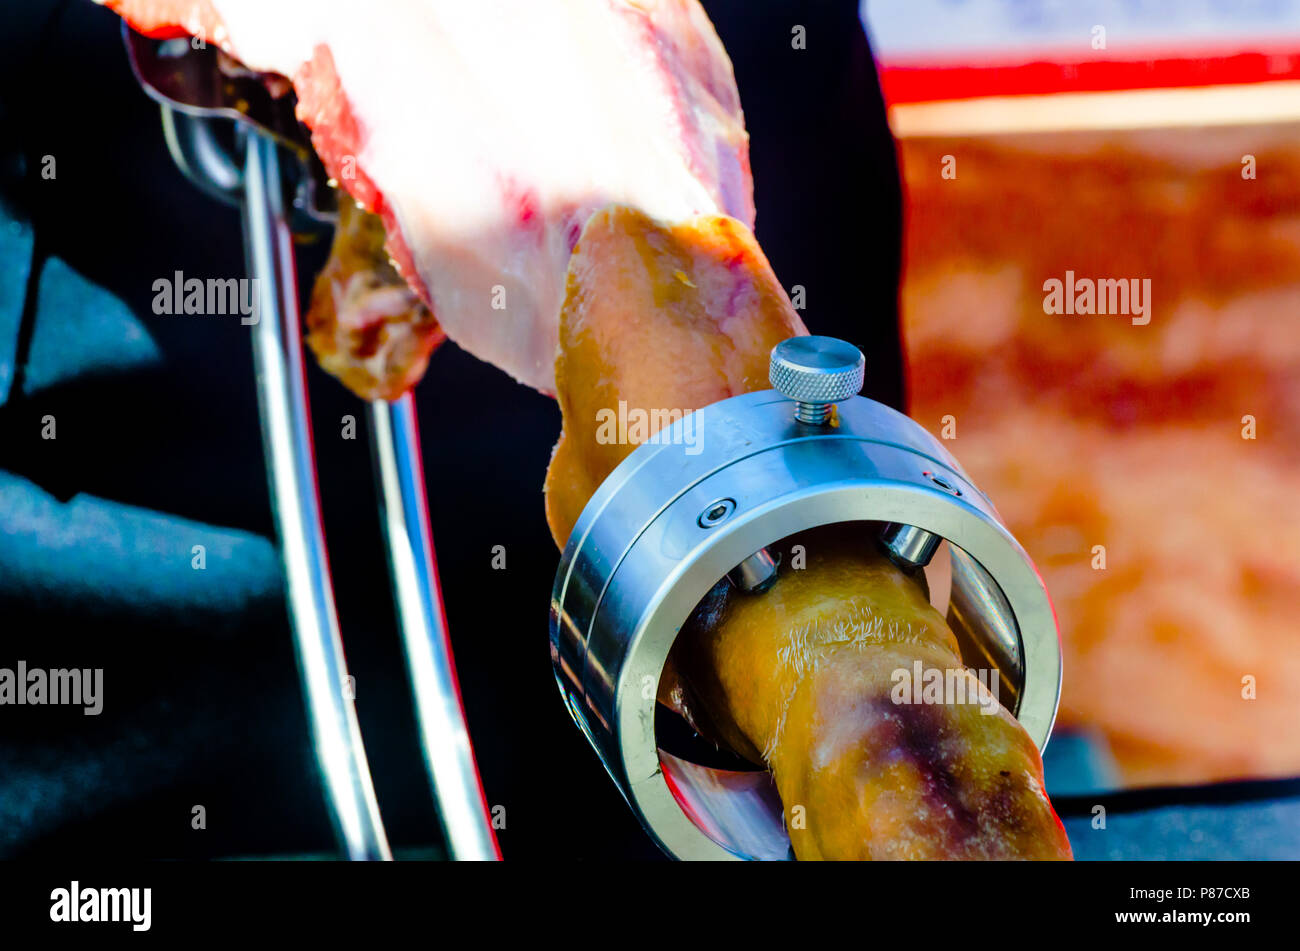 leg jamon serrano prepared for slicing, traditional Spanish ham, meat - Stock Image